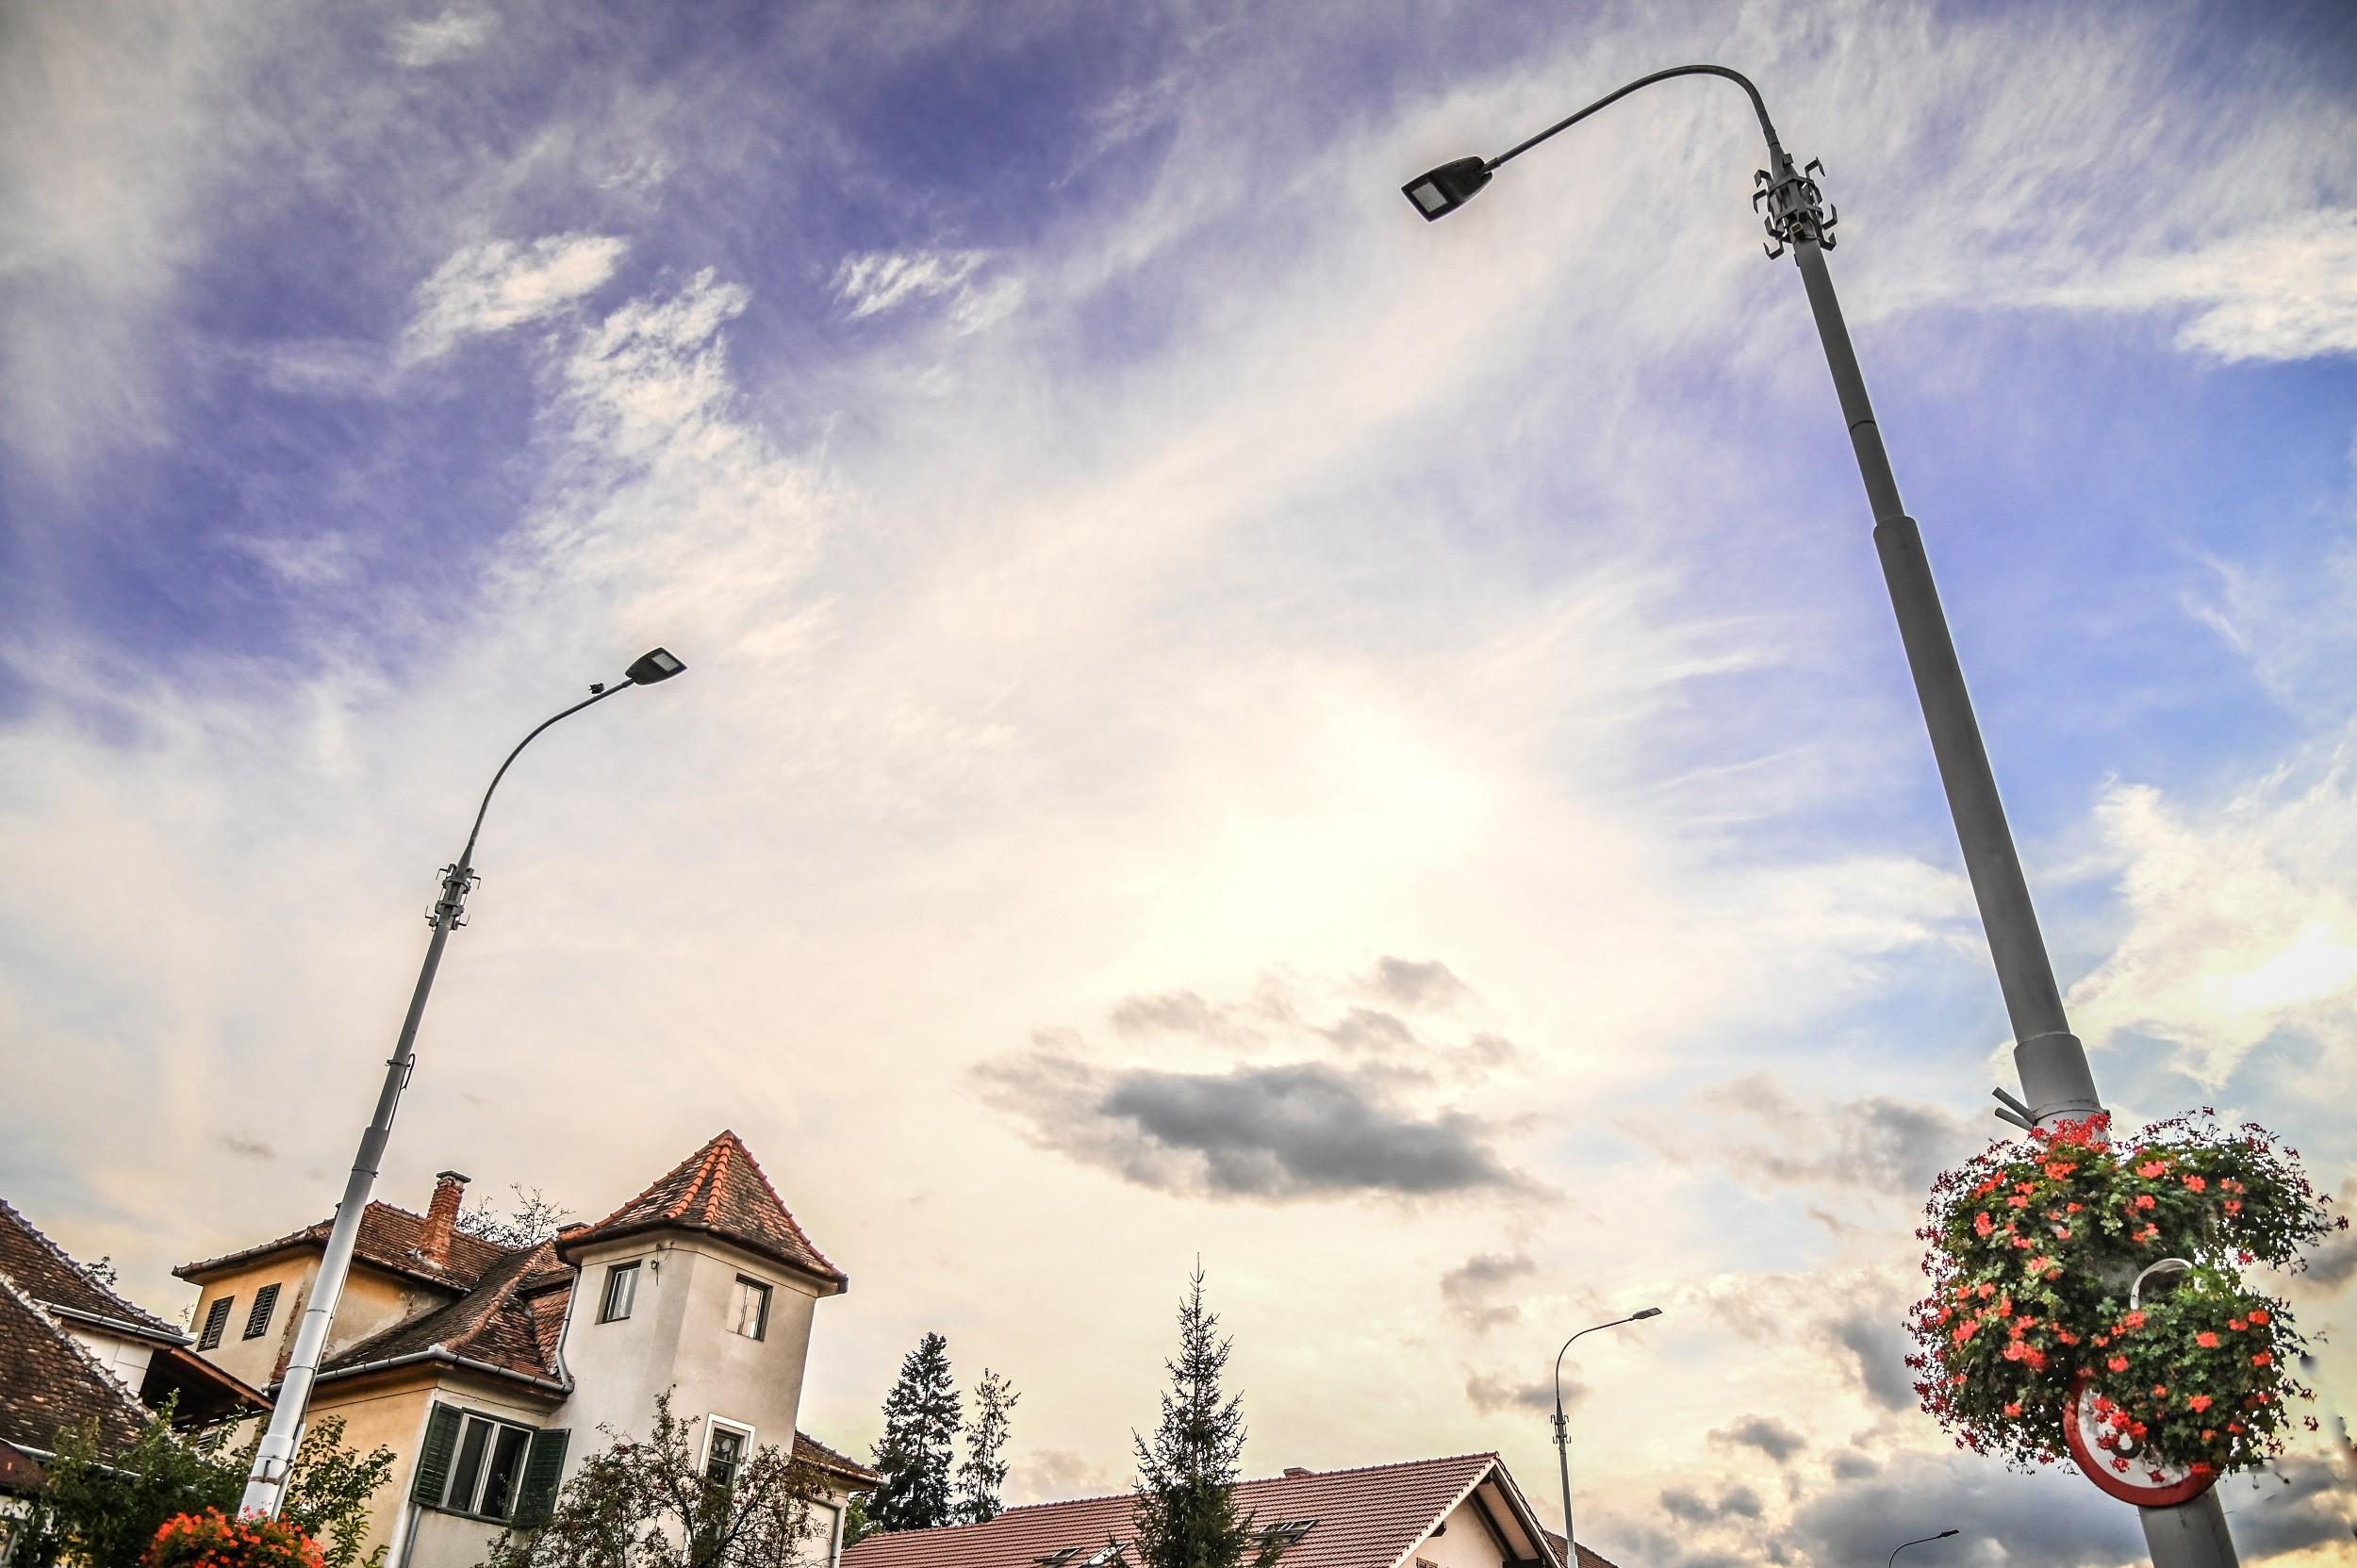 FOTO- Patru bulevarde din Sibiu au iluminat nou, cu LED